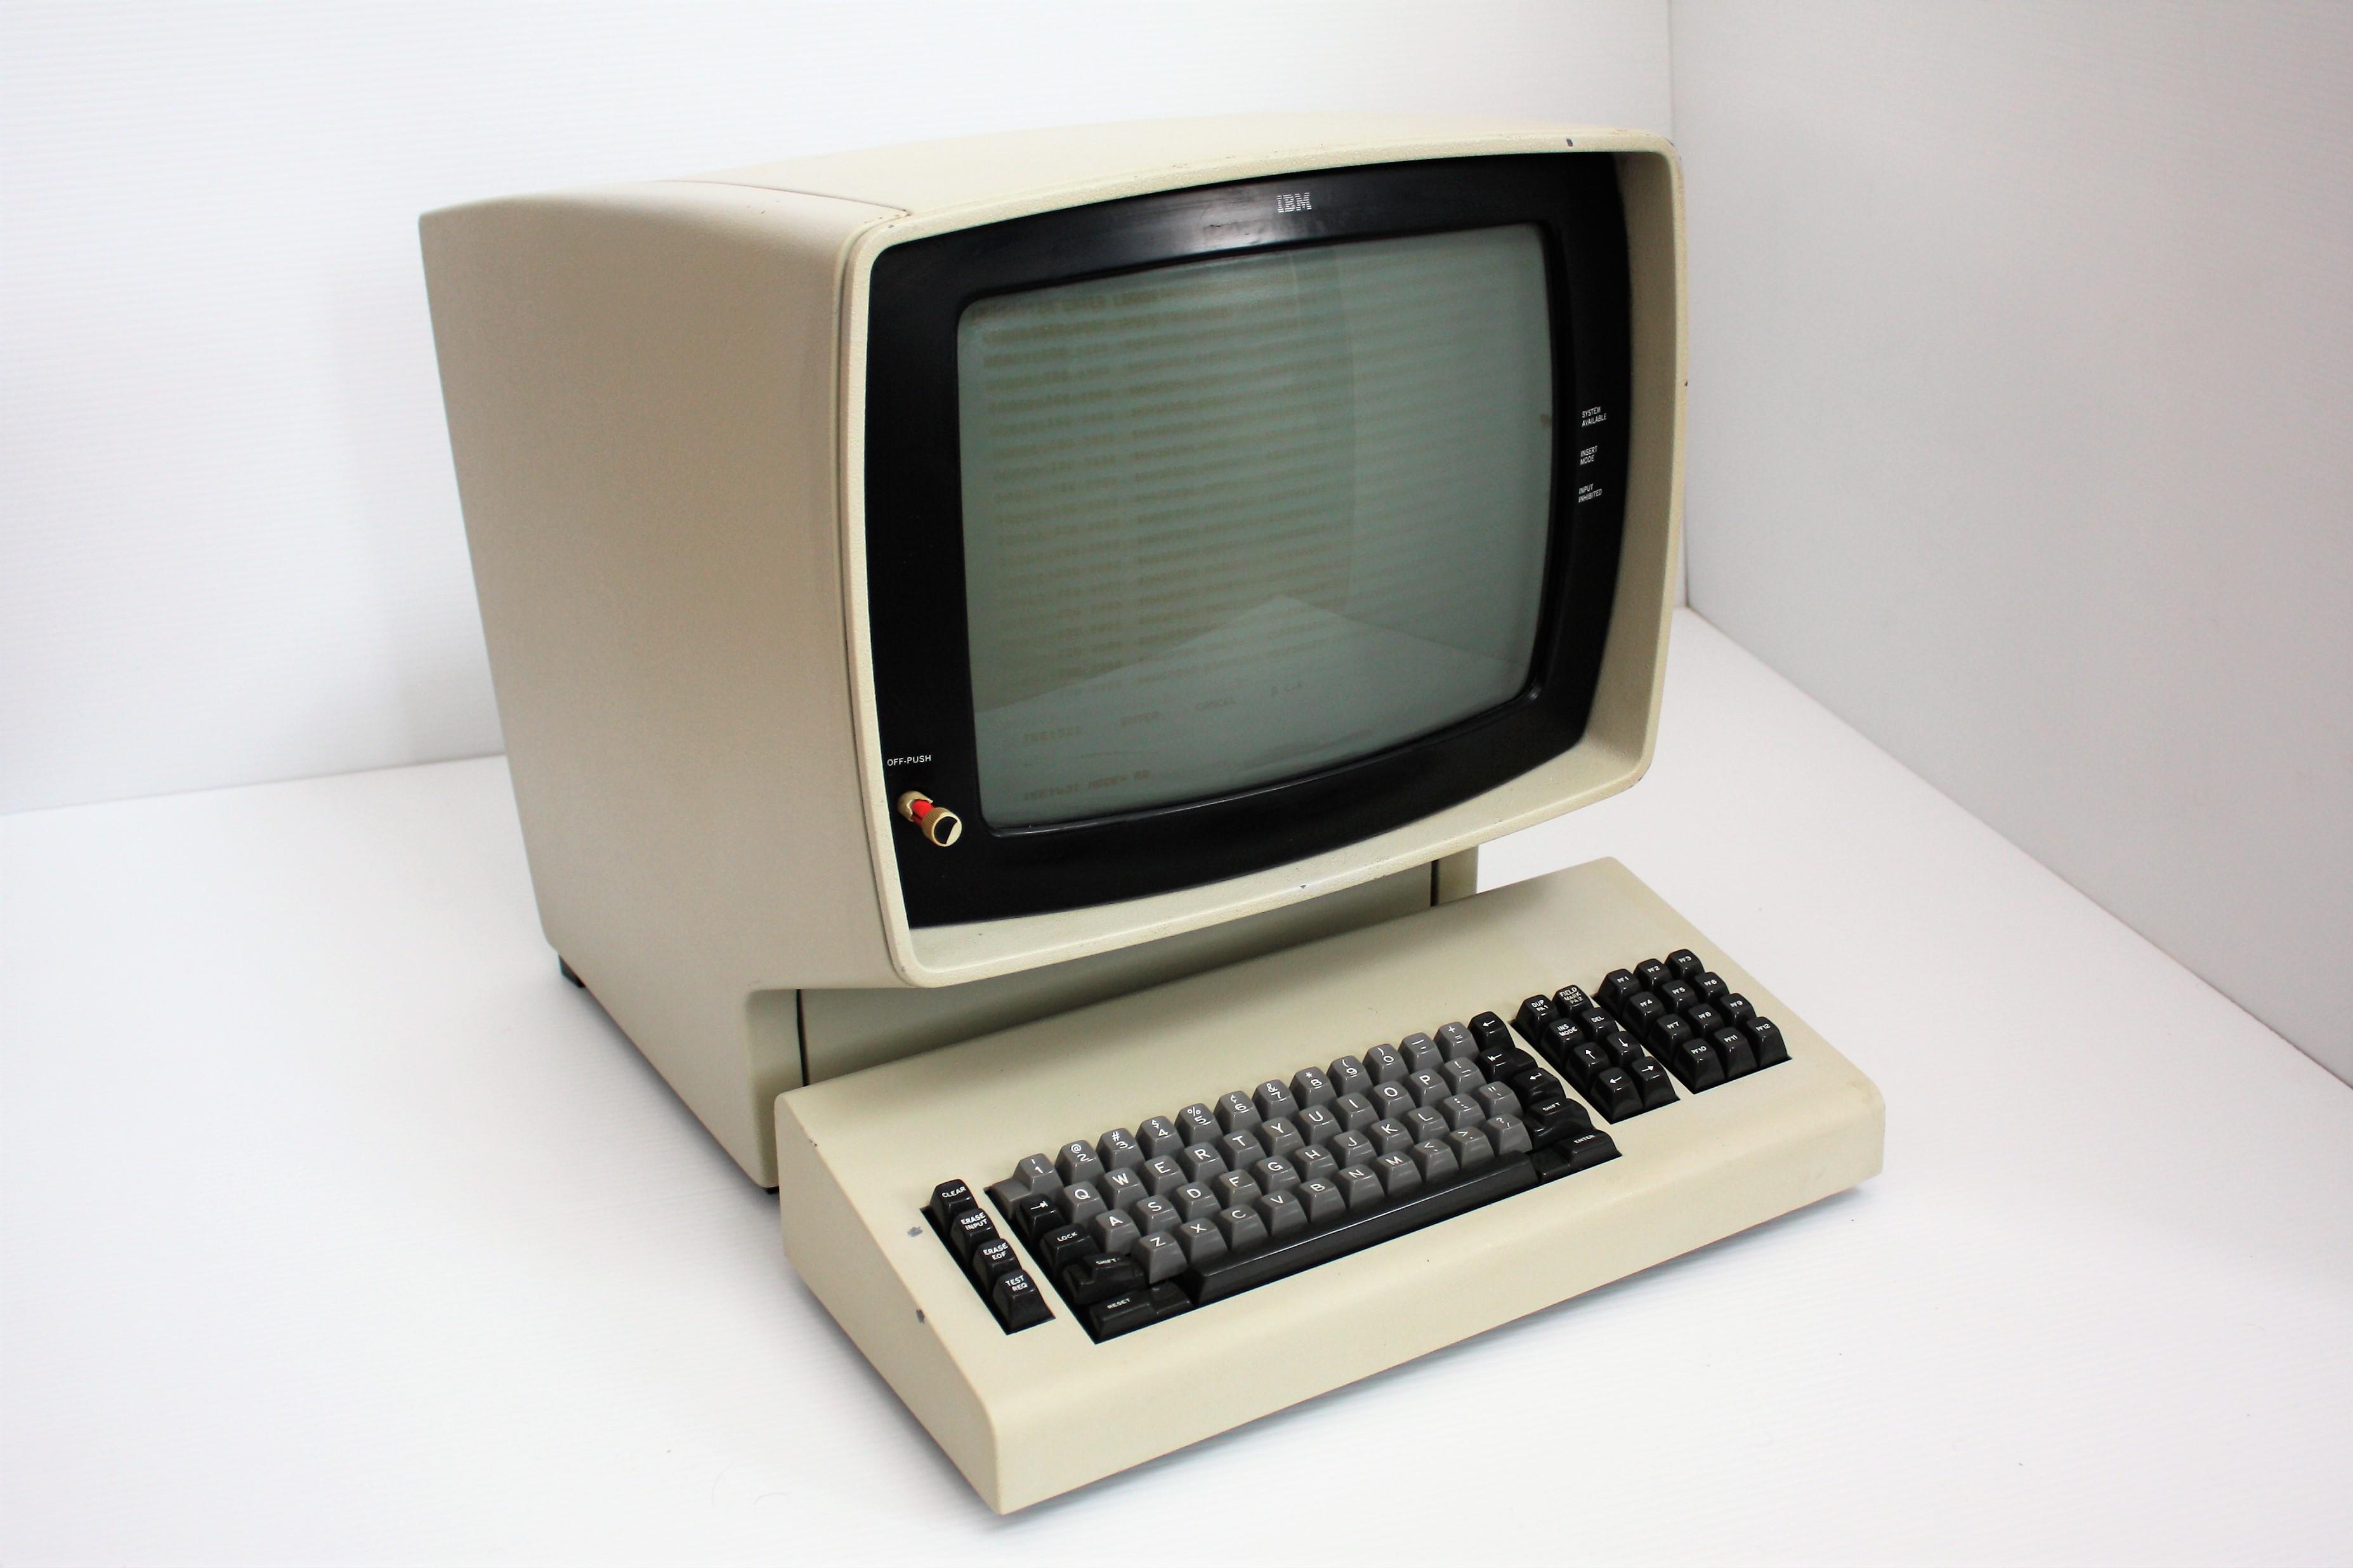 IBM_3277_Model_2_terminal.jpg